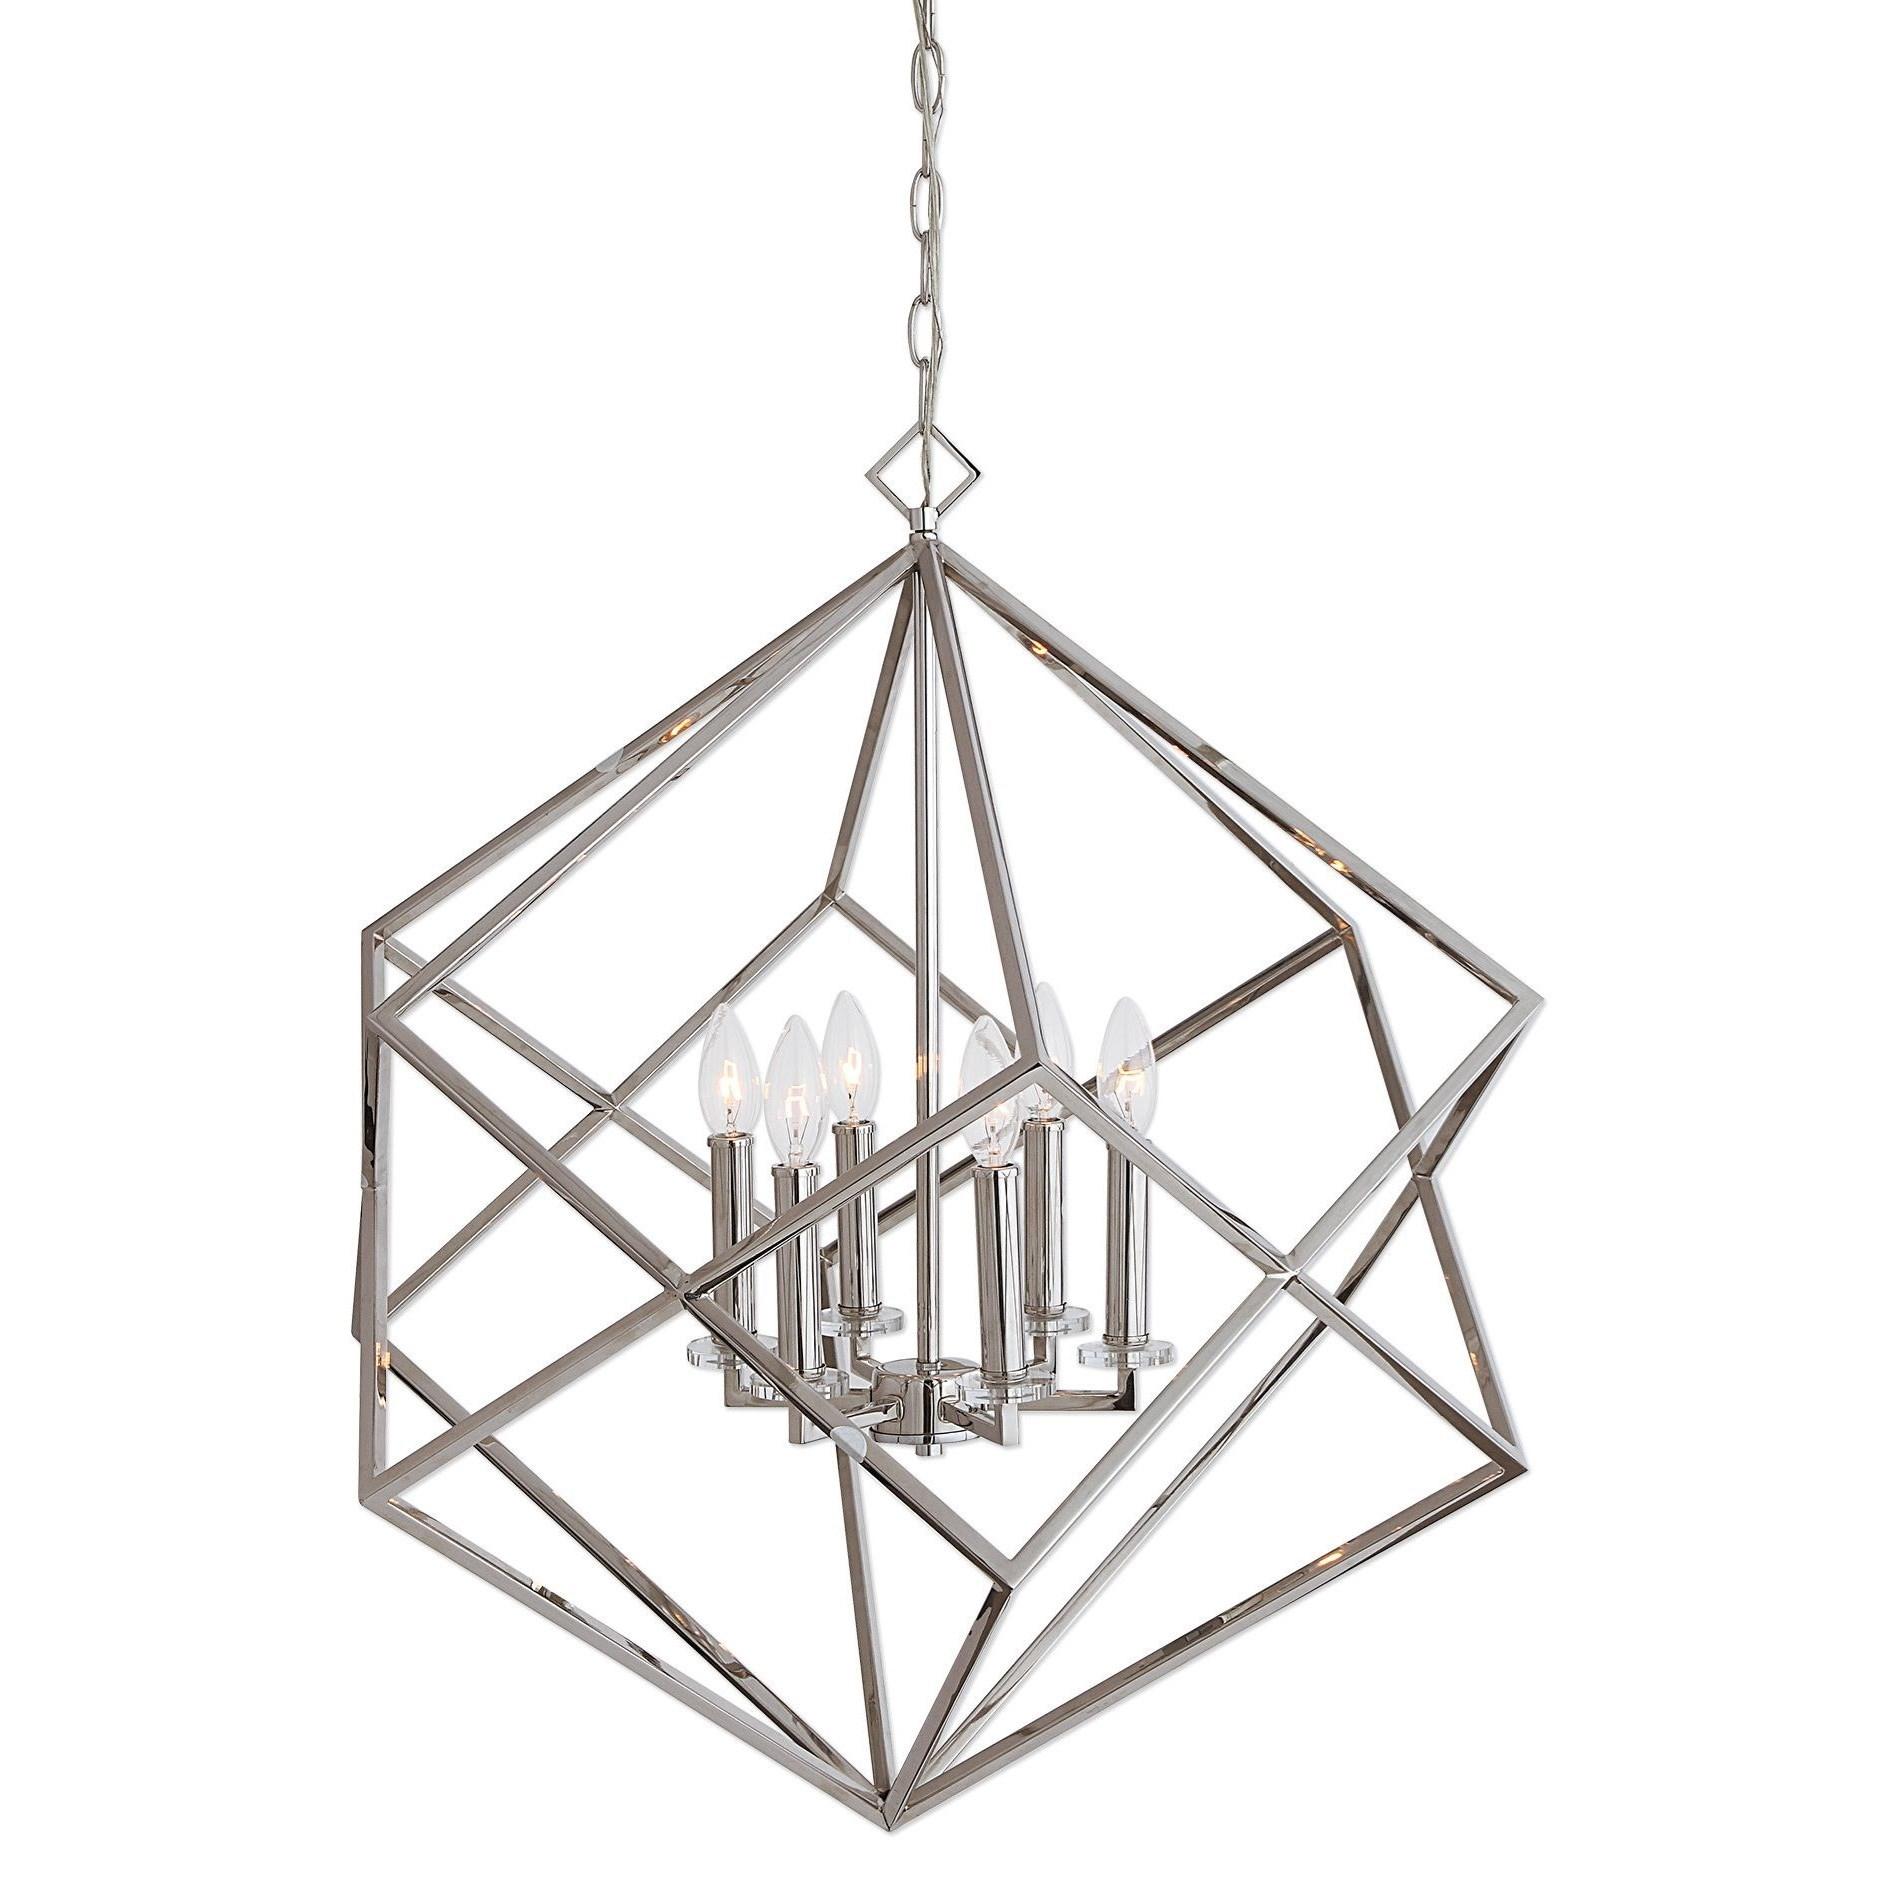 Lighting Fixtures - Pendant Lights Euclid 6 Light Nickel Cube Pendant by Uttermost at Mueller Furniture